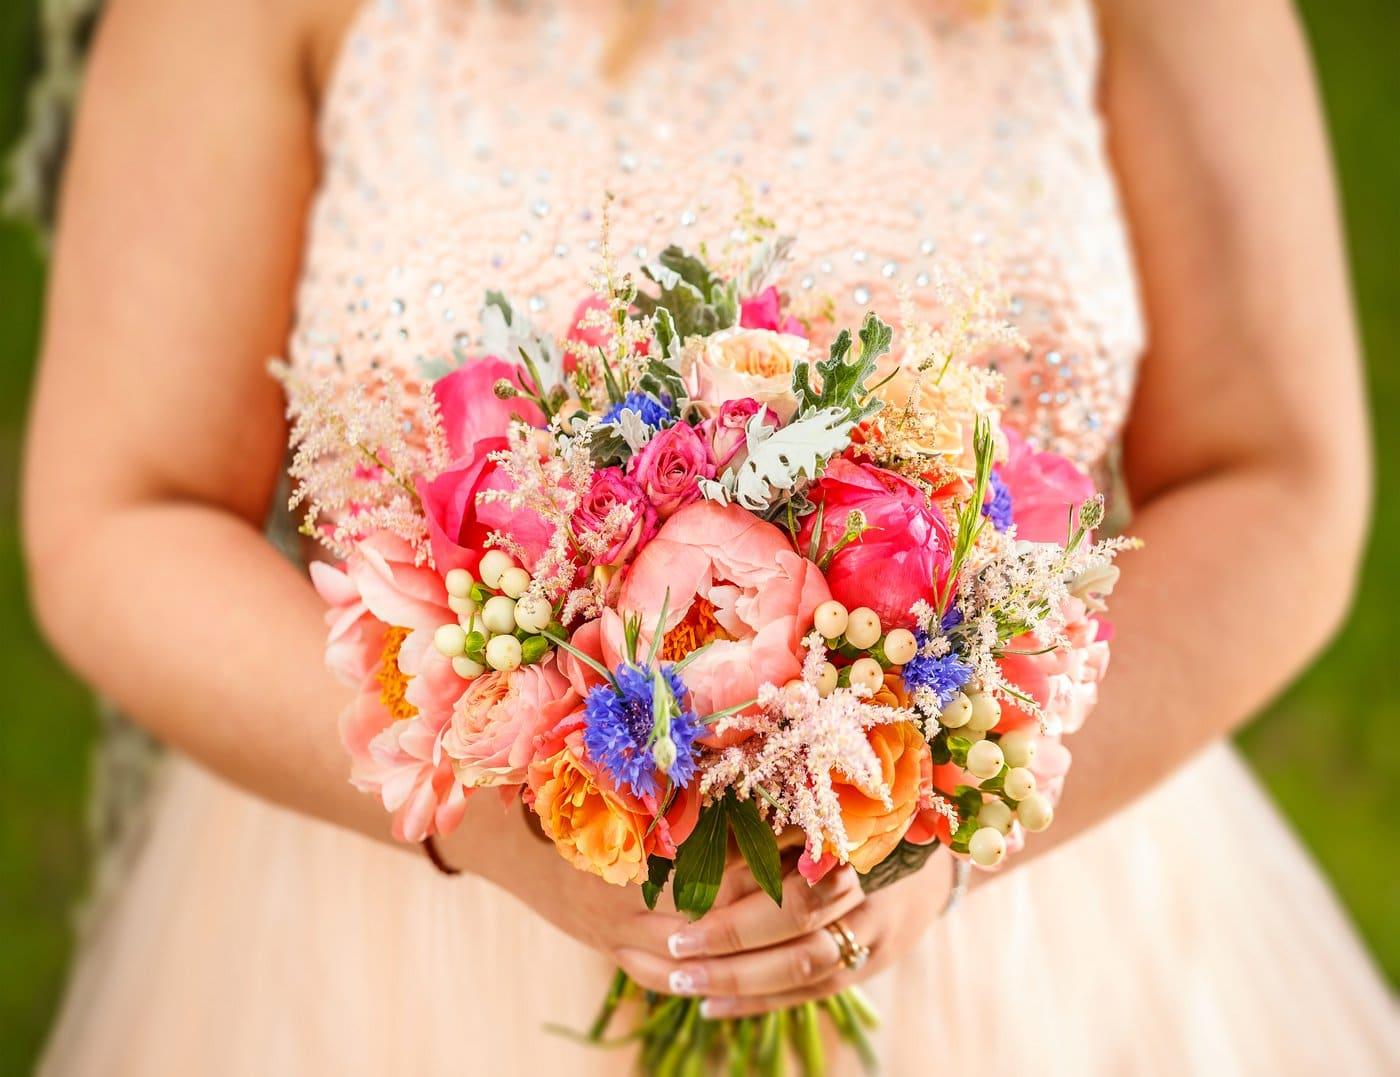 Wedding dress and bridal bouquet